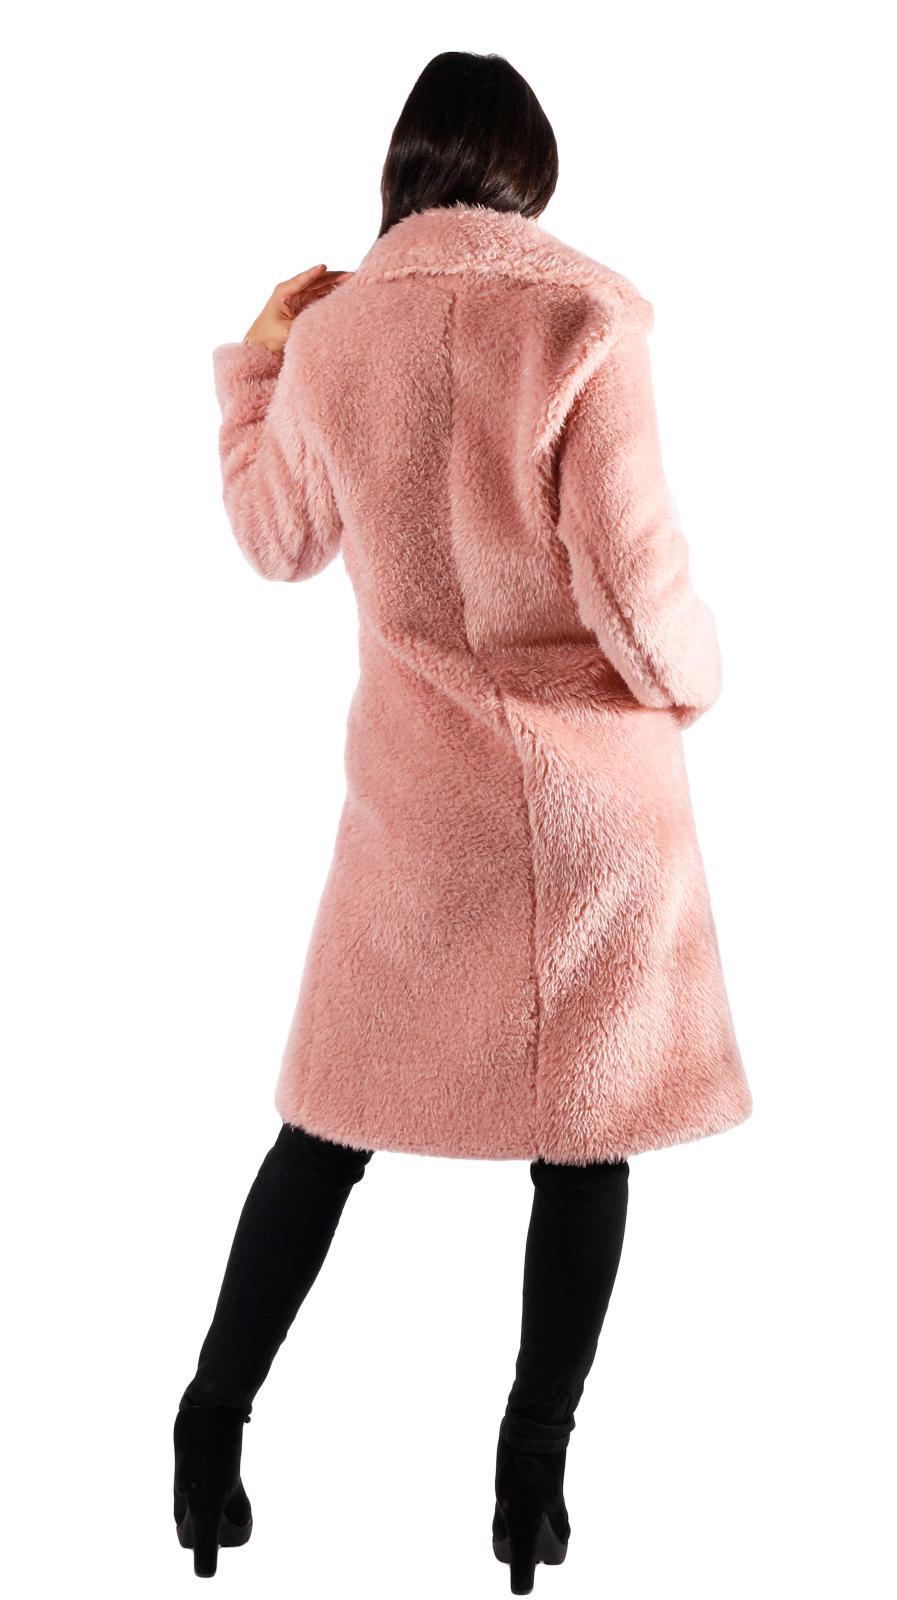 khujo Damen Mantel TYRA rosa langer leichter Sommermantel aus Lyocell Trenchcoat